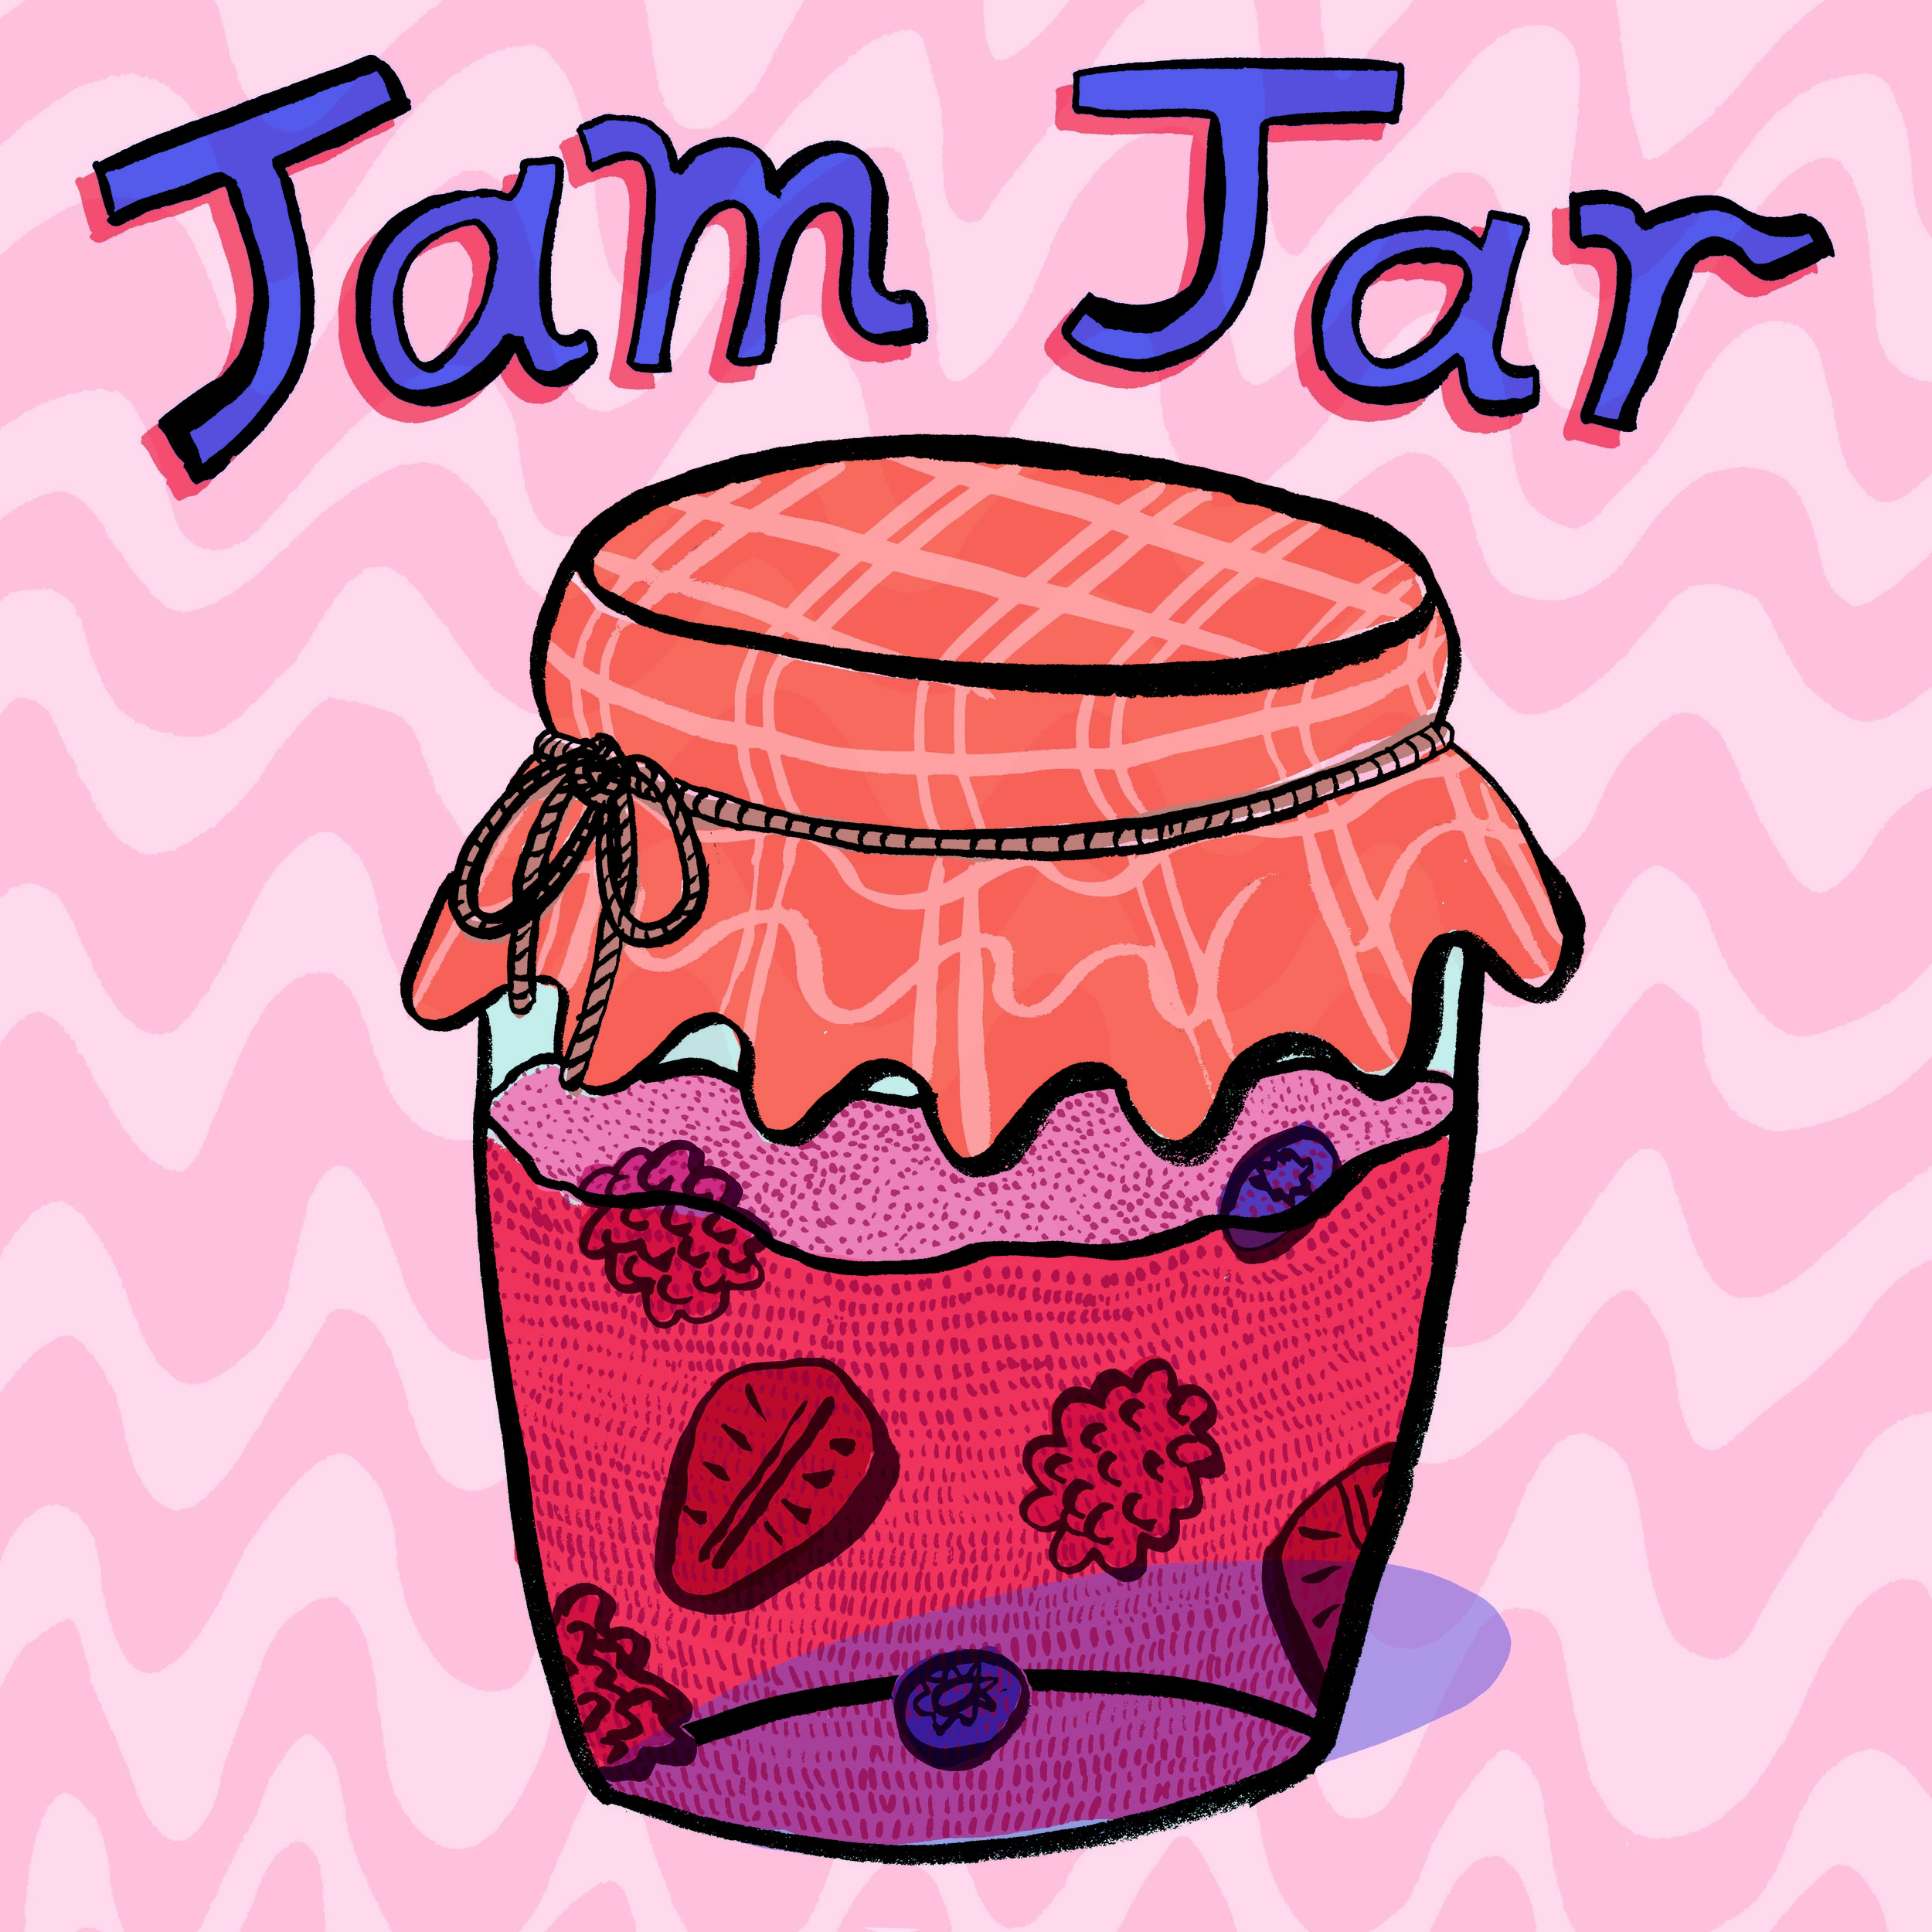 Jam Jar_front_low res.jpg